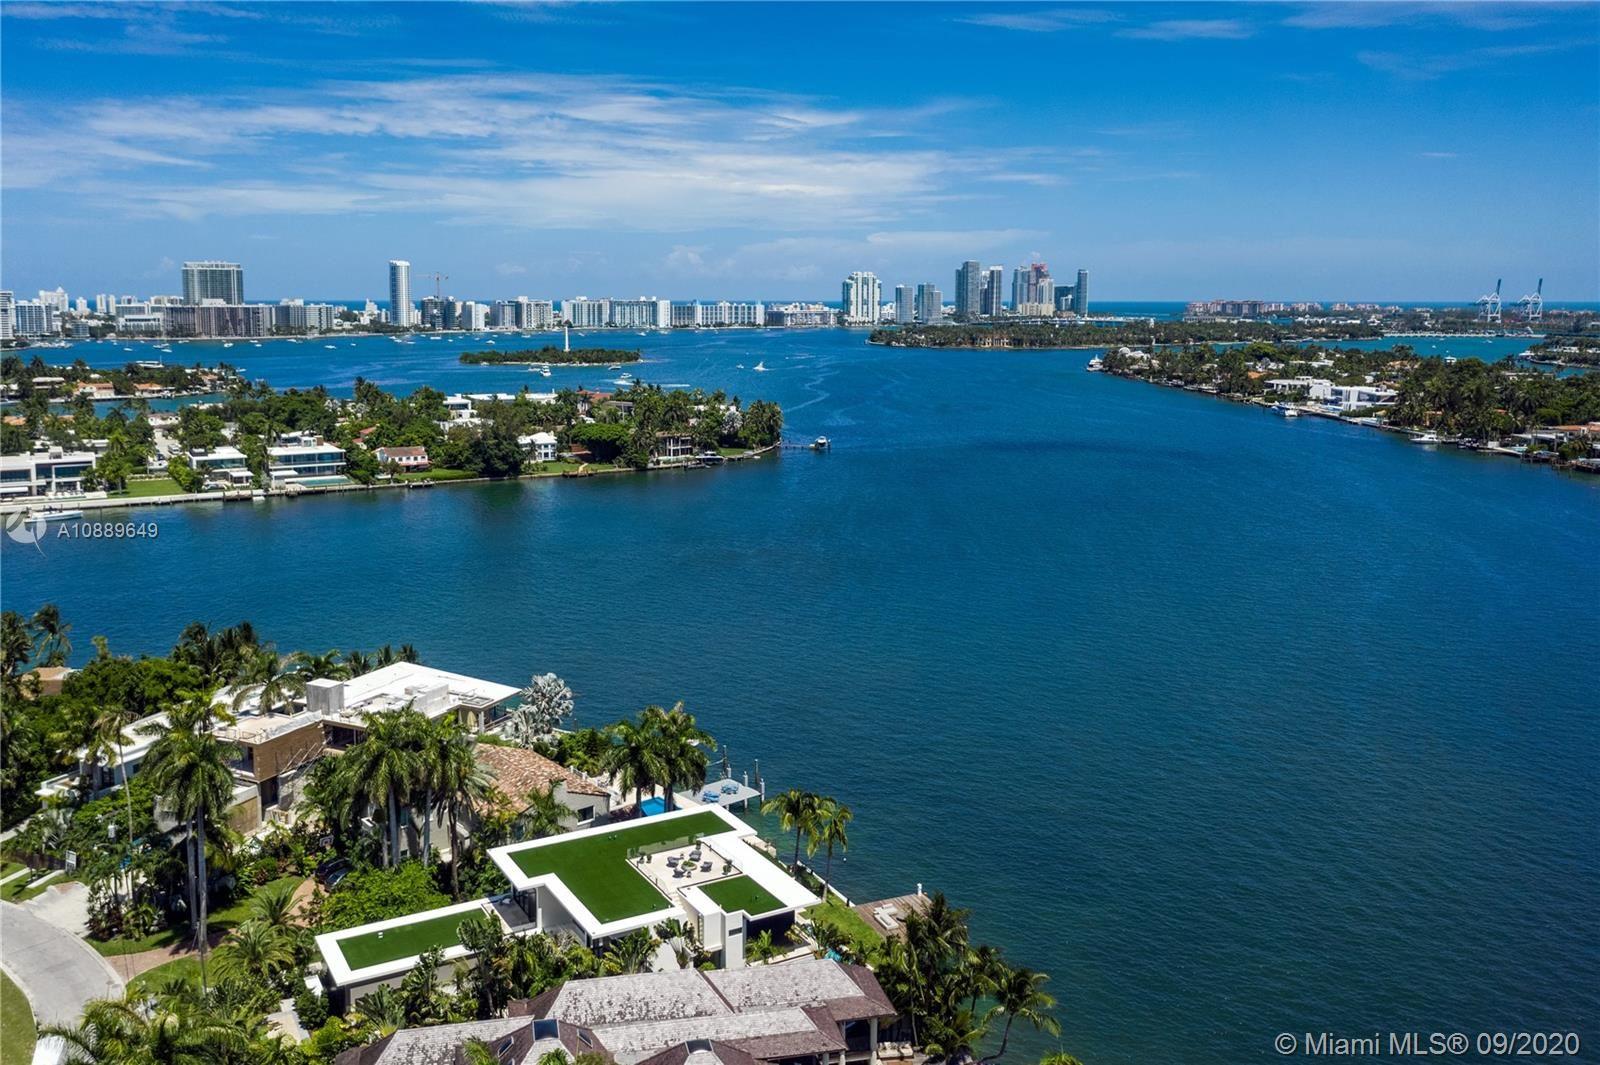 Photo 69 of Listing MLS a10889649 in 10 W San Marino Dr Miami Beach FL 33139